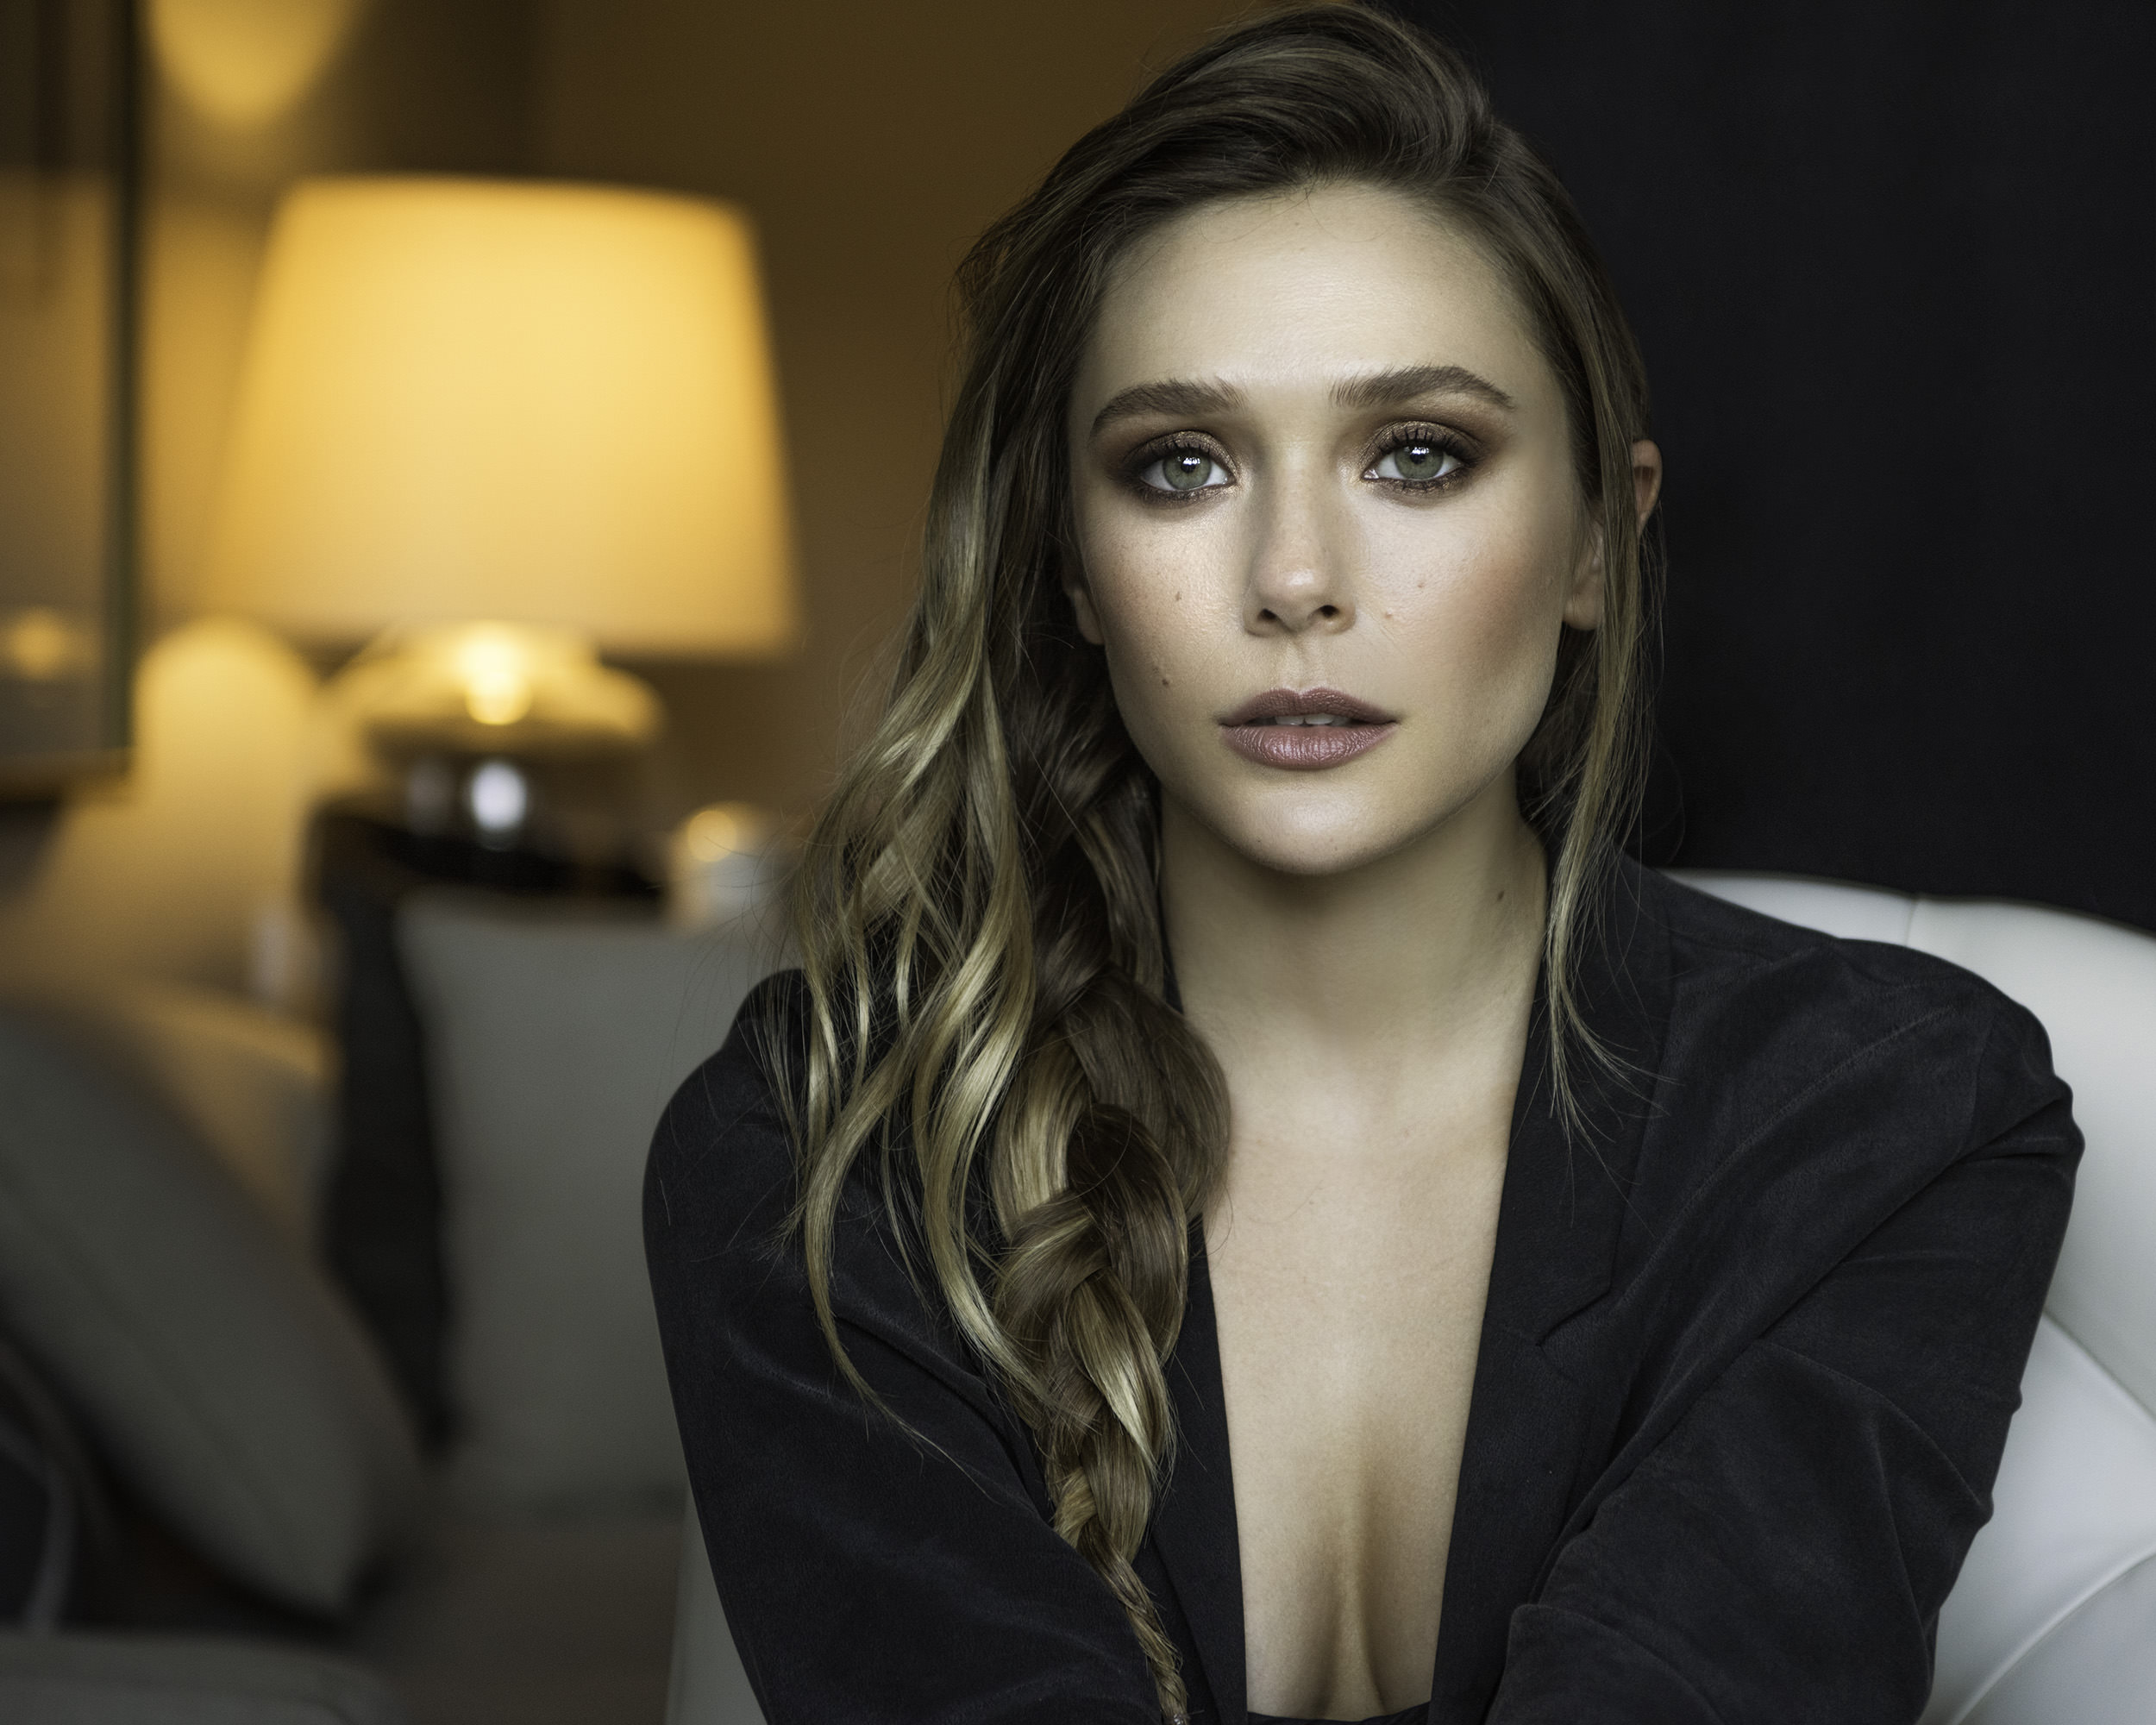 Fondos de pantalla Elizabeth Olsen